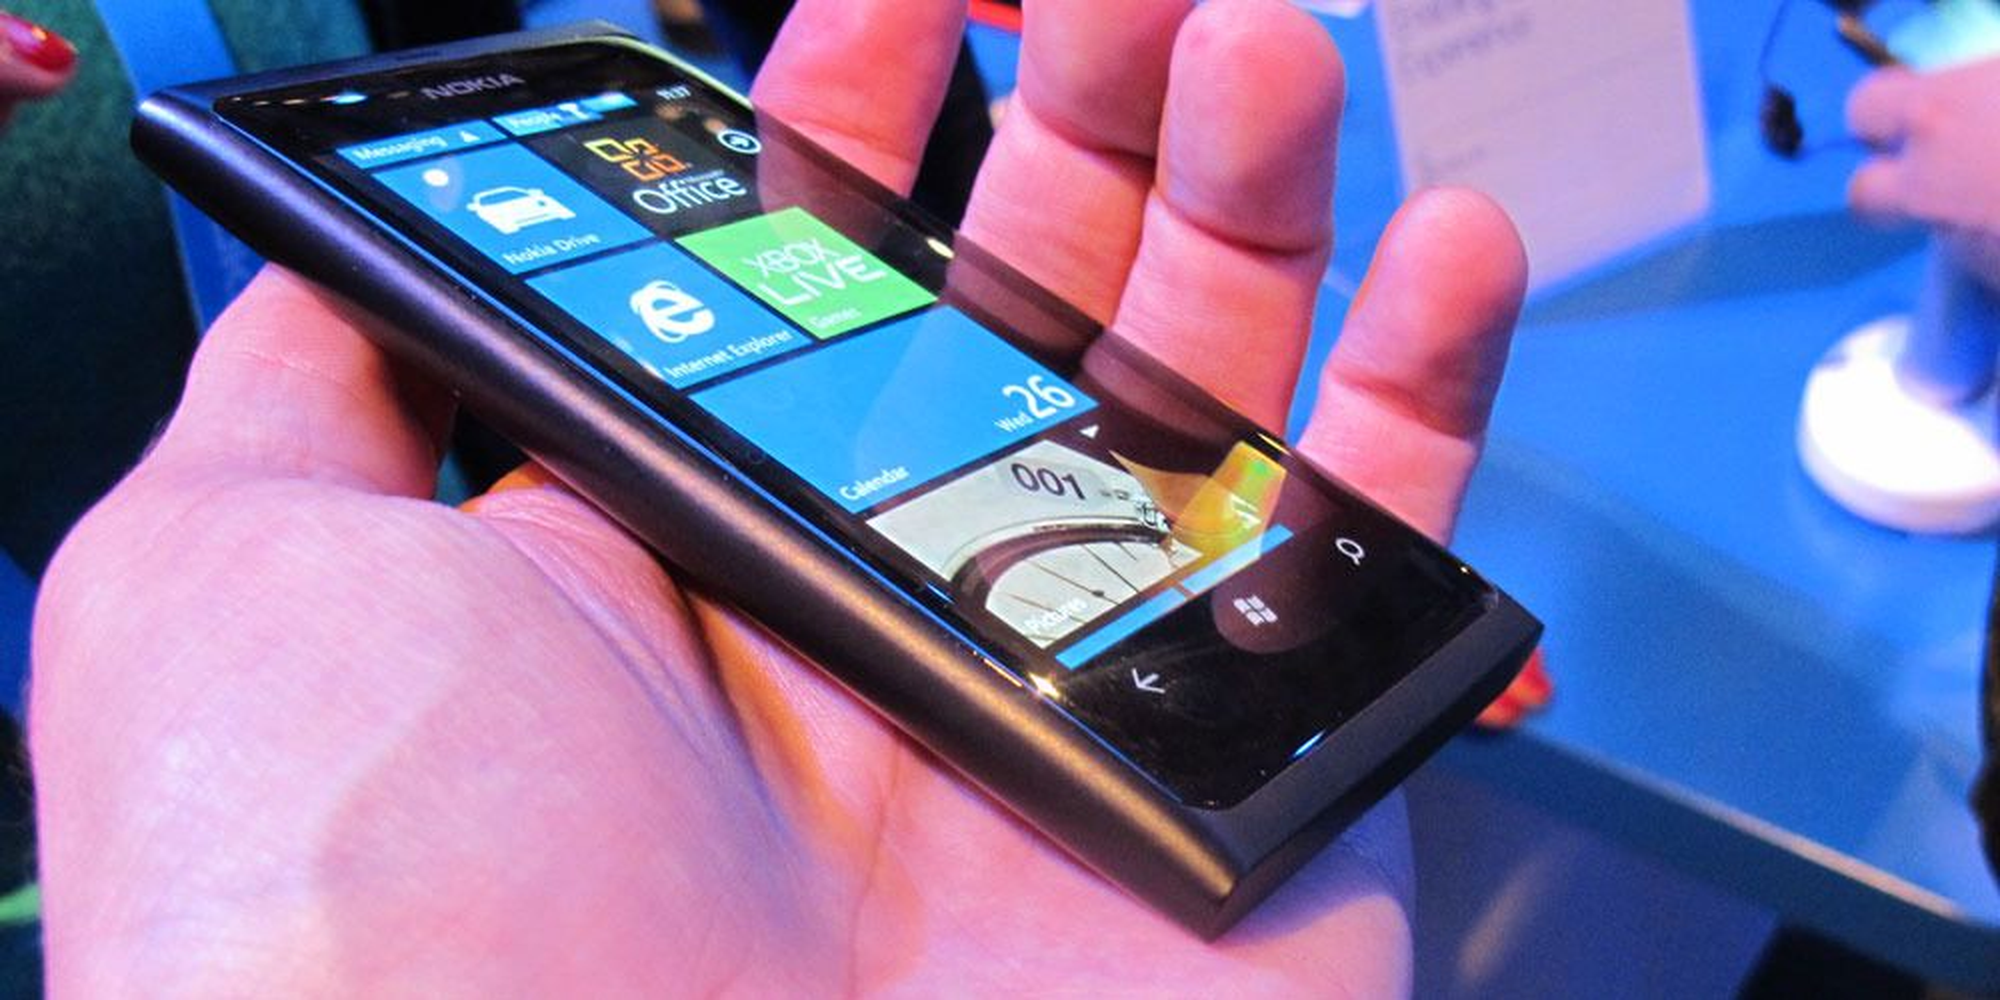 Nokia Lumia 800 kommer om to uker